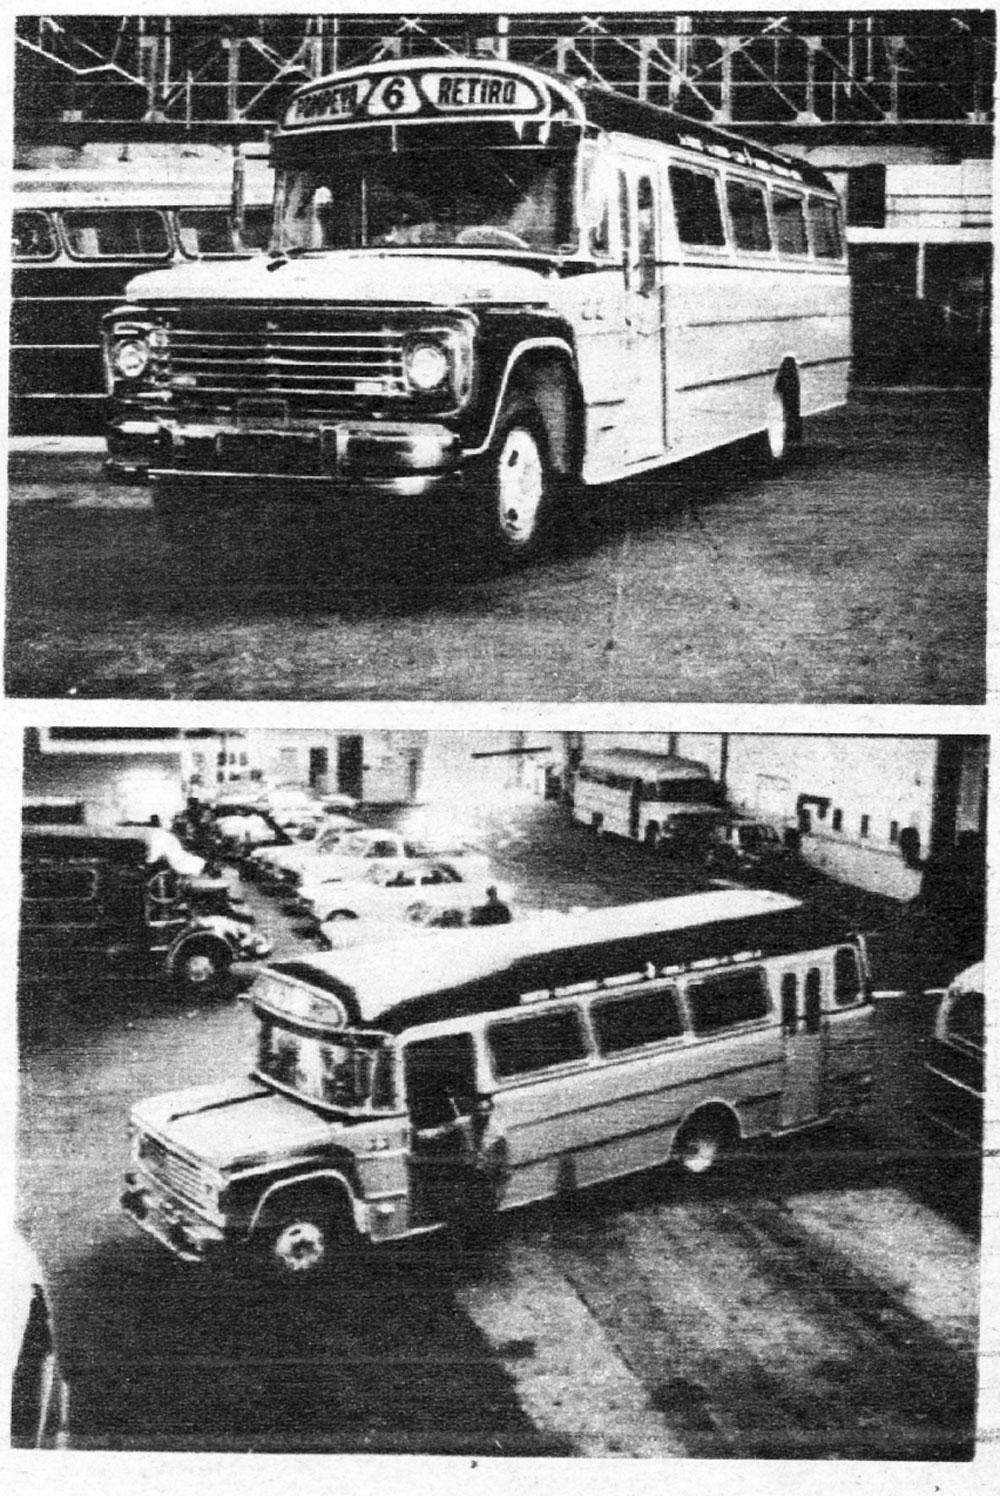 Camión Argentino: Ford B-7000